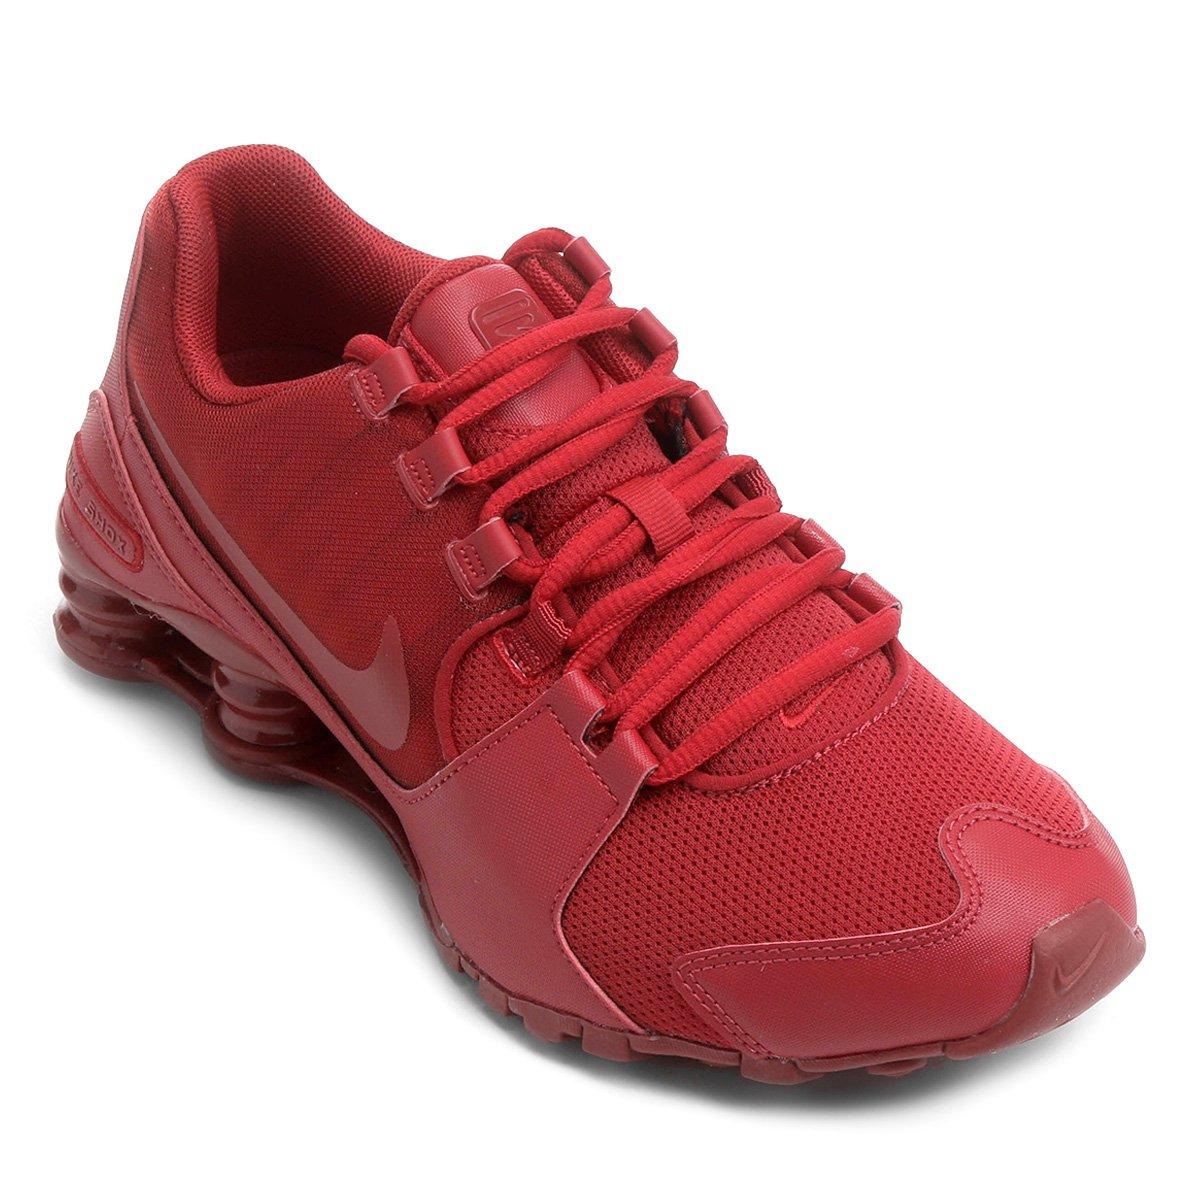 68bd77bece2 Tênis Nike Shox Avenue Masculino - Compre Agora